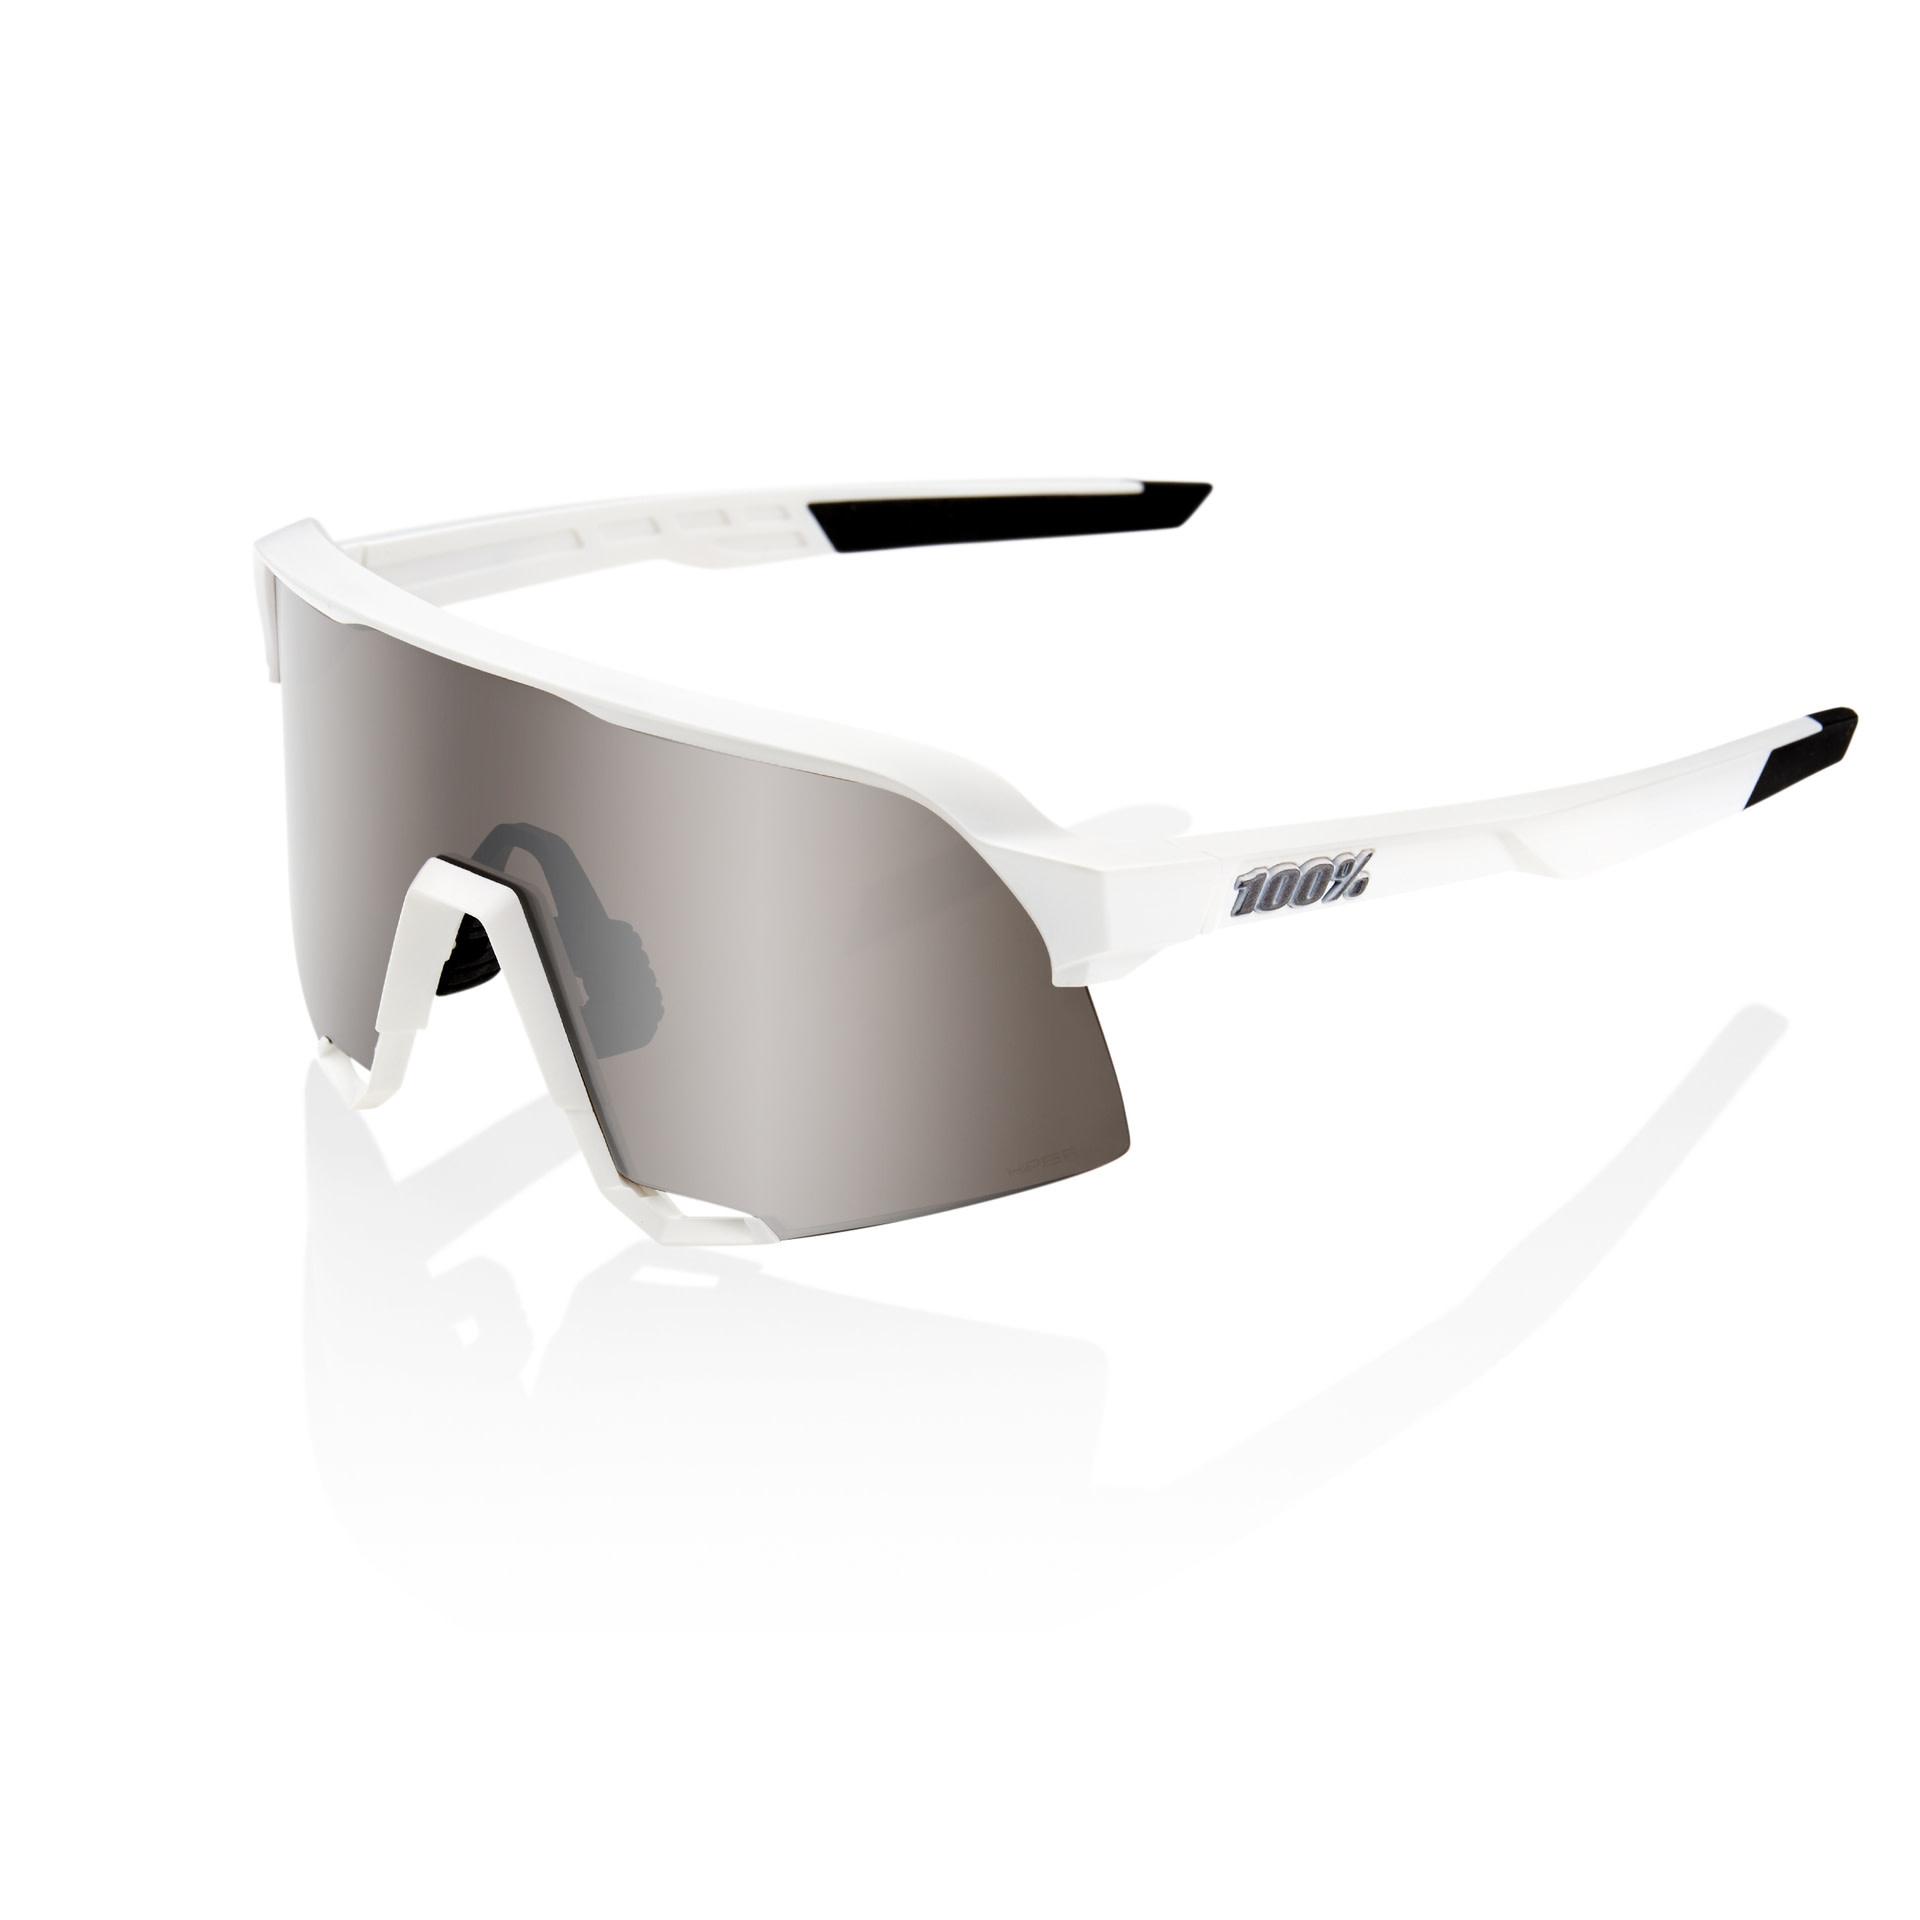 100% S3 White - Hiper Silver Multilayer Lens-1